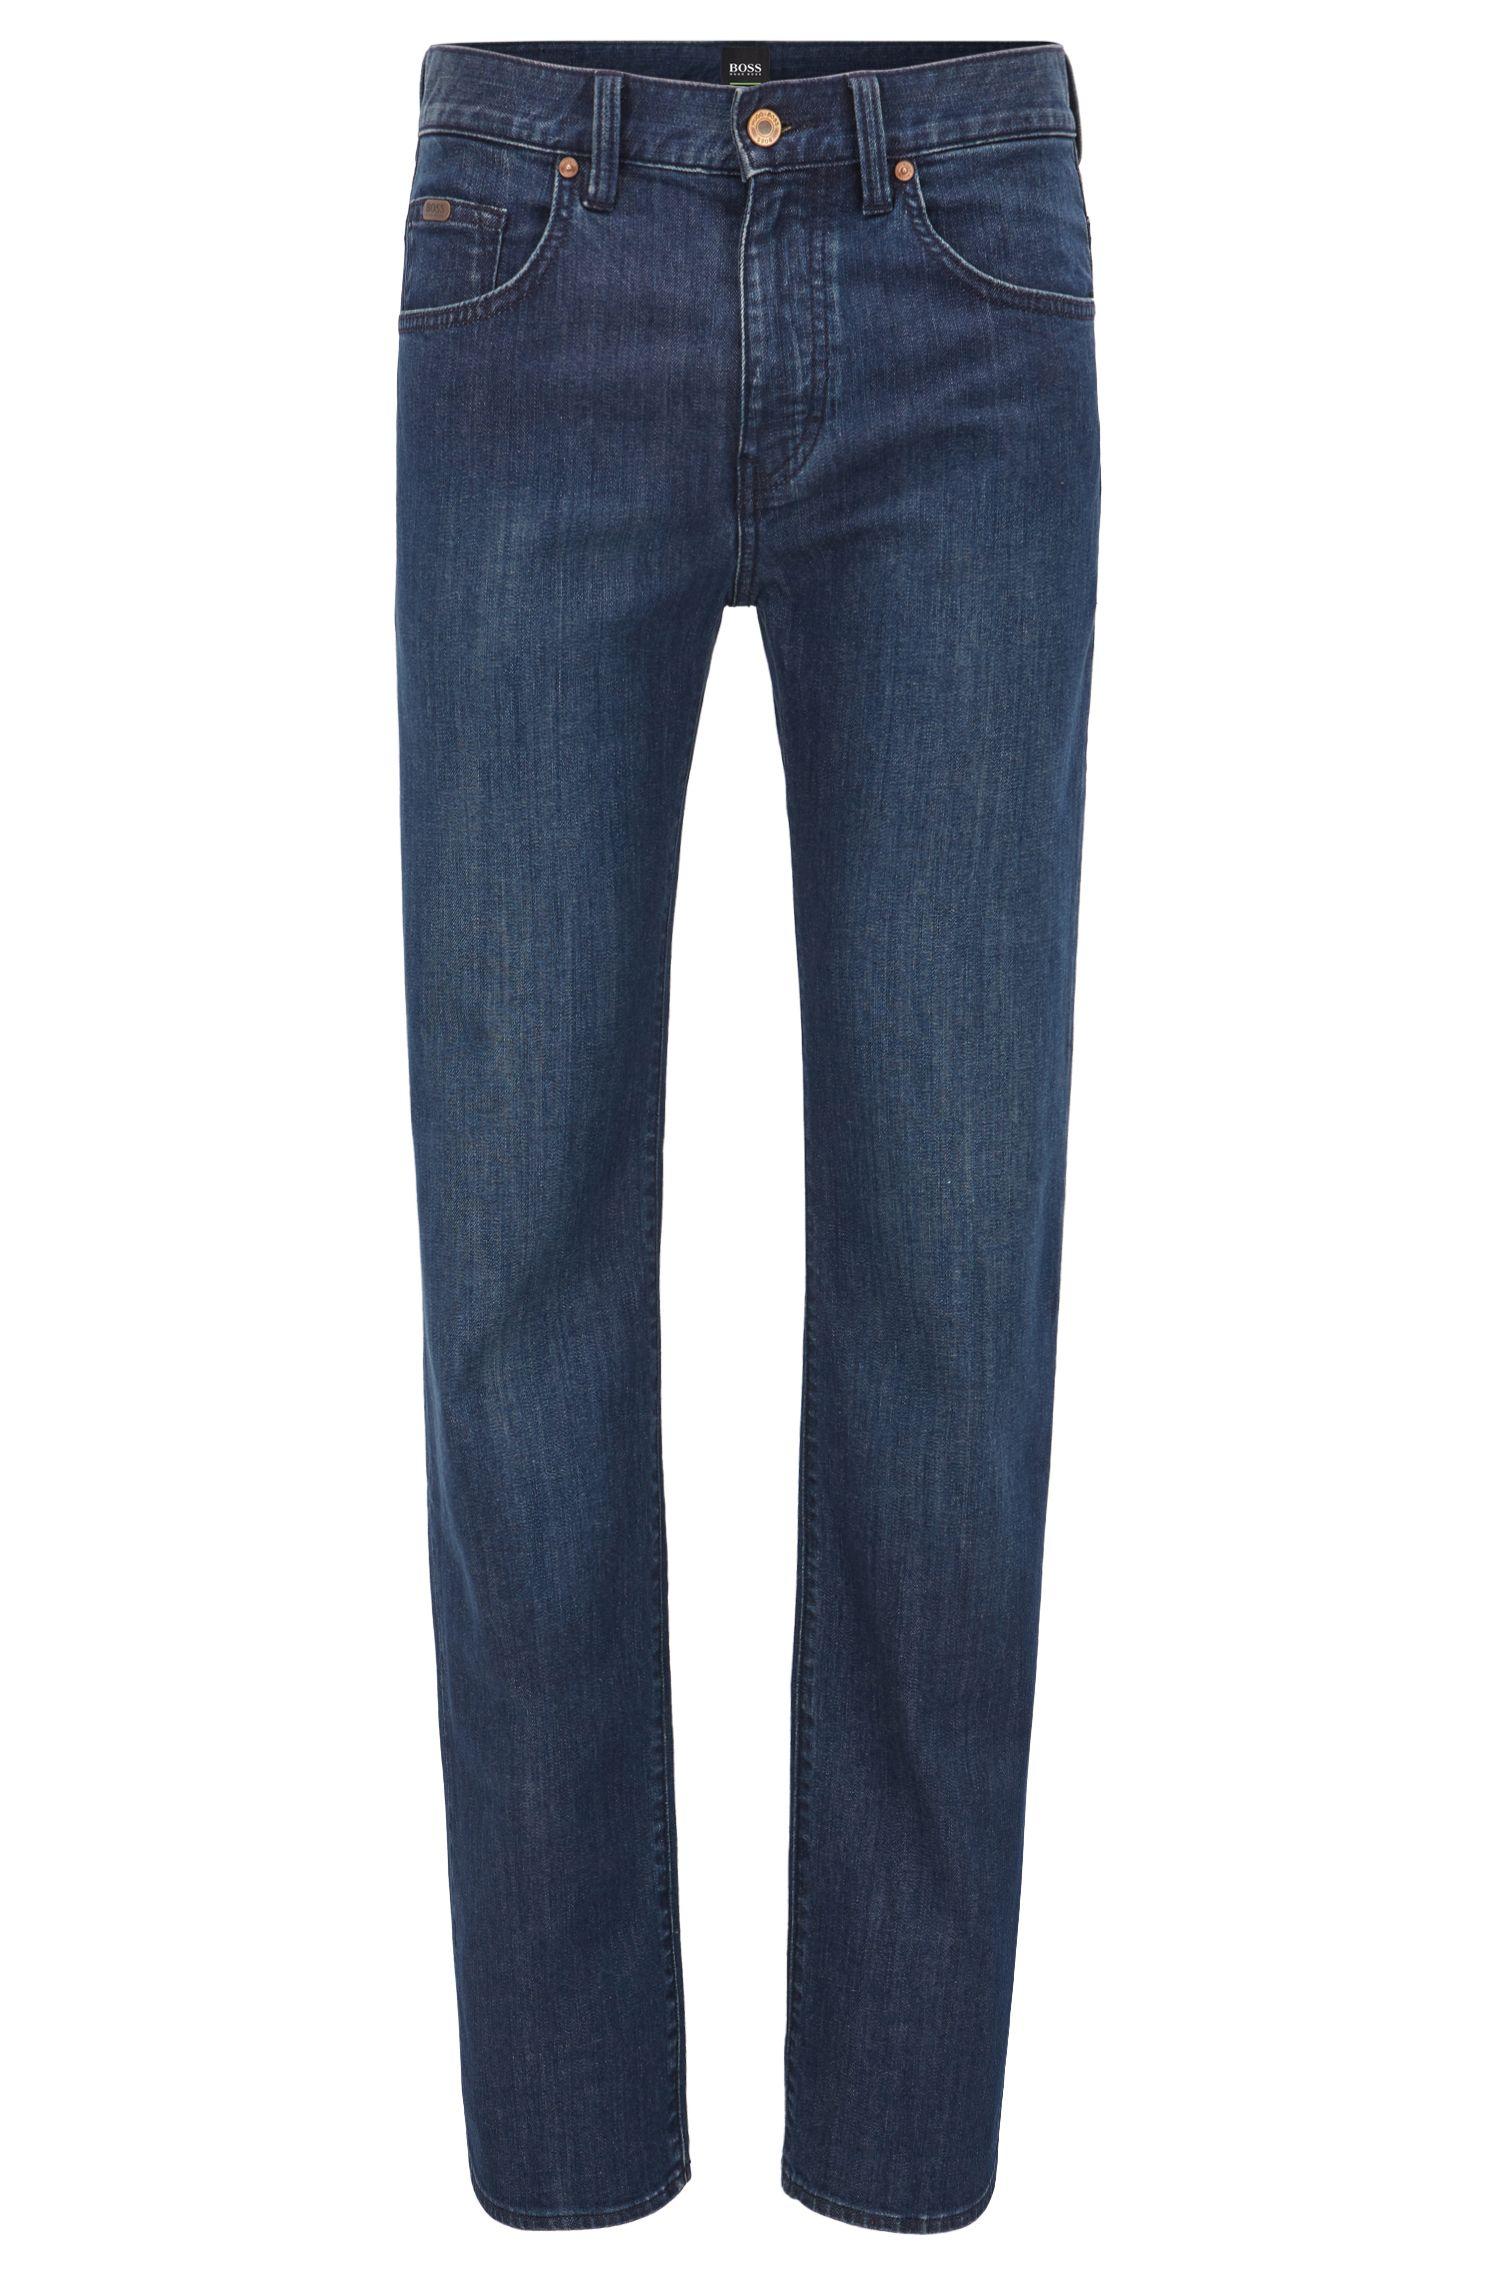 Jeans Relaxed Fit en denim stretch à jambes droites